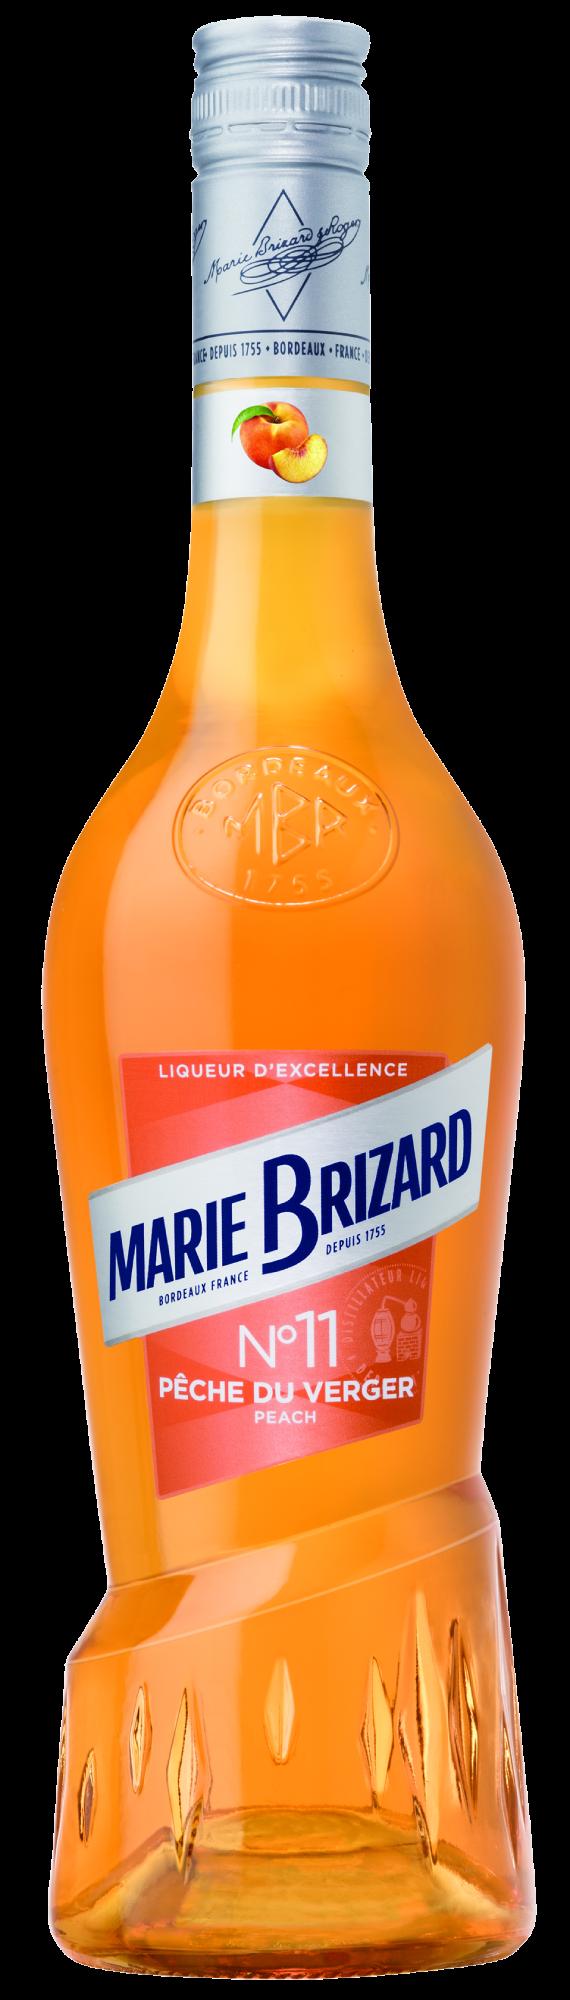 Marie Brizard Peche du Verger магазин склад wine wine